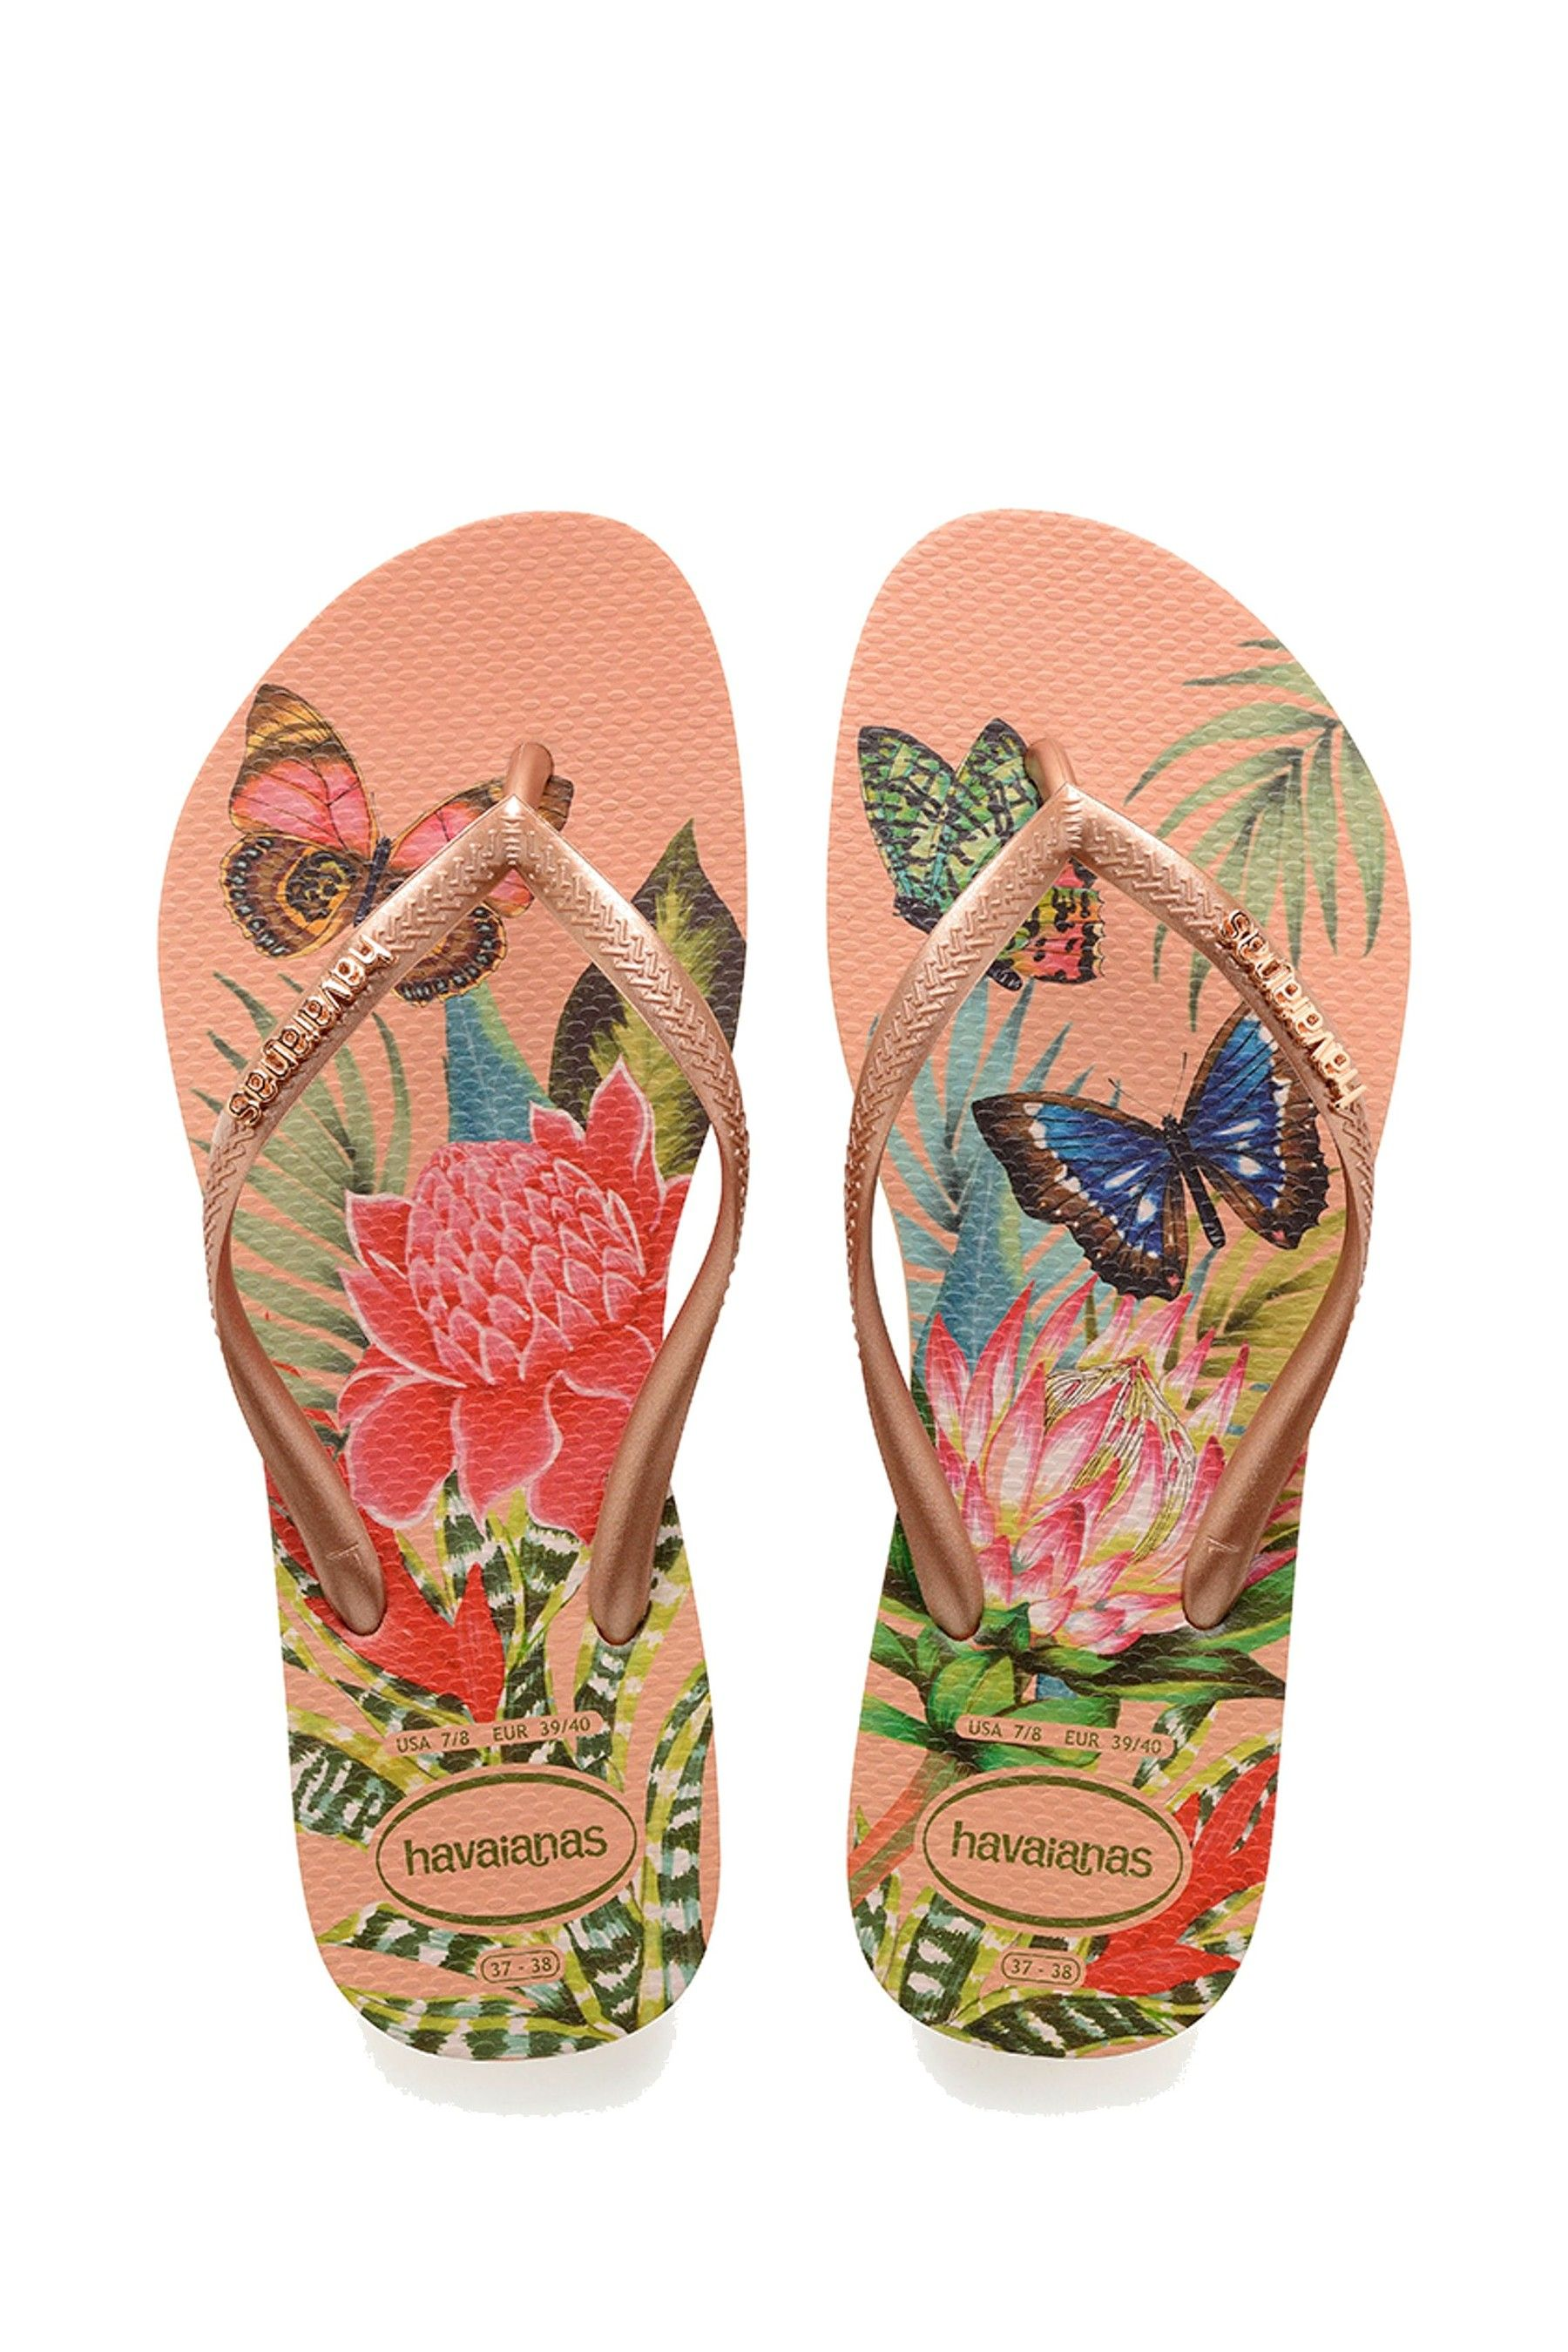 Havaianas Slim Thematic Collection Flip Flops Authentic Brazilian-Latest Arrival